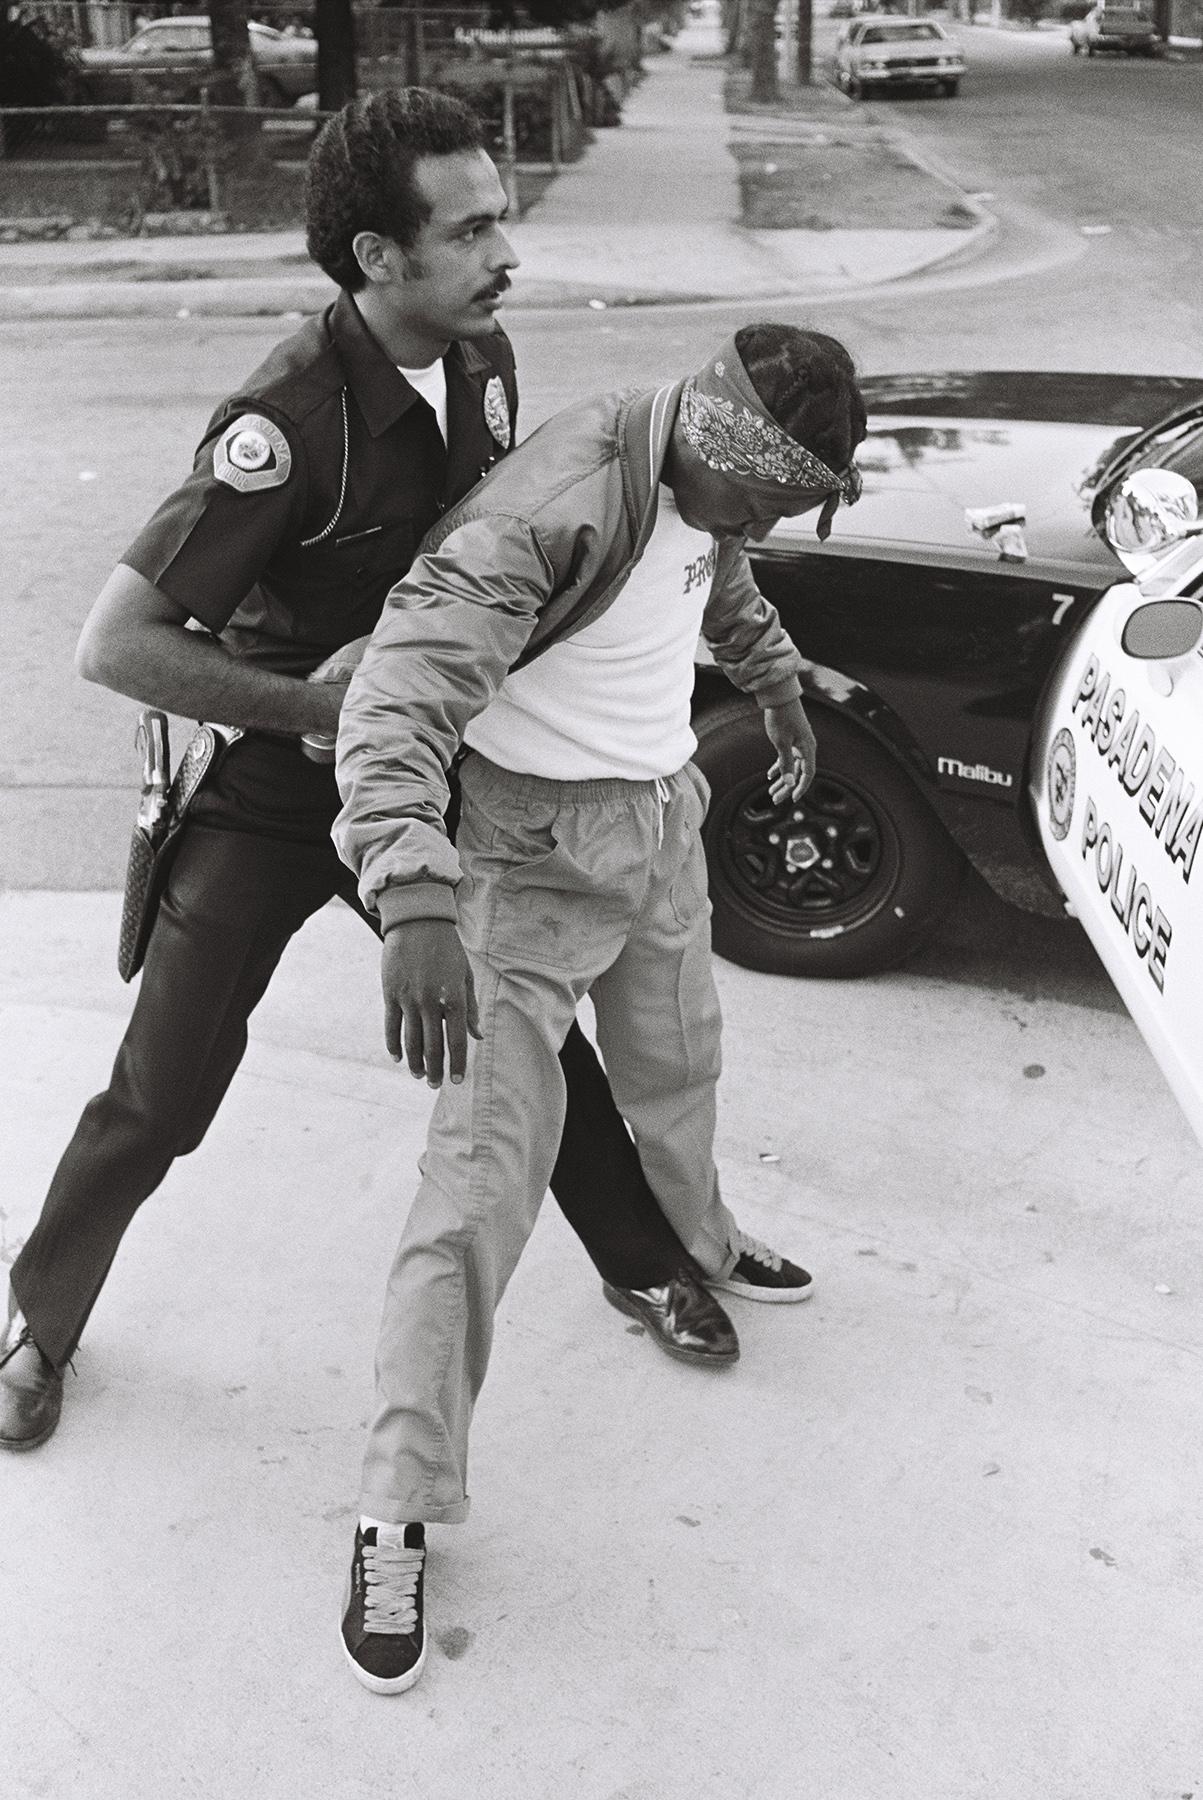 William_Valentine_PasadenaPD_Officer Delgado with Raymond Avenue Crip_3.jpg